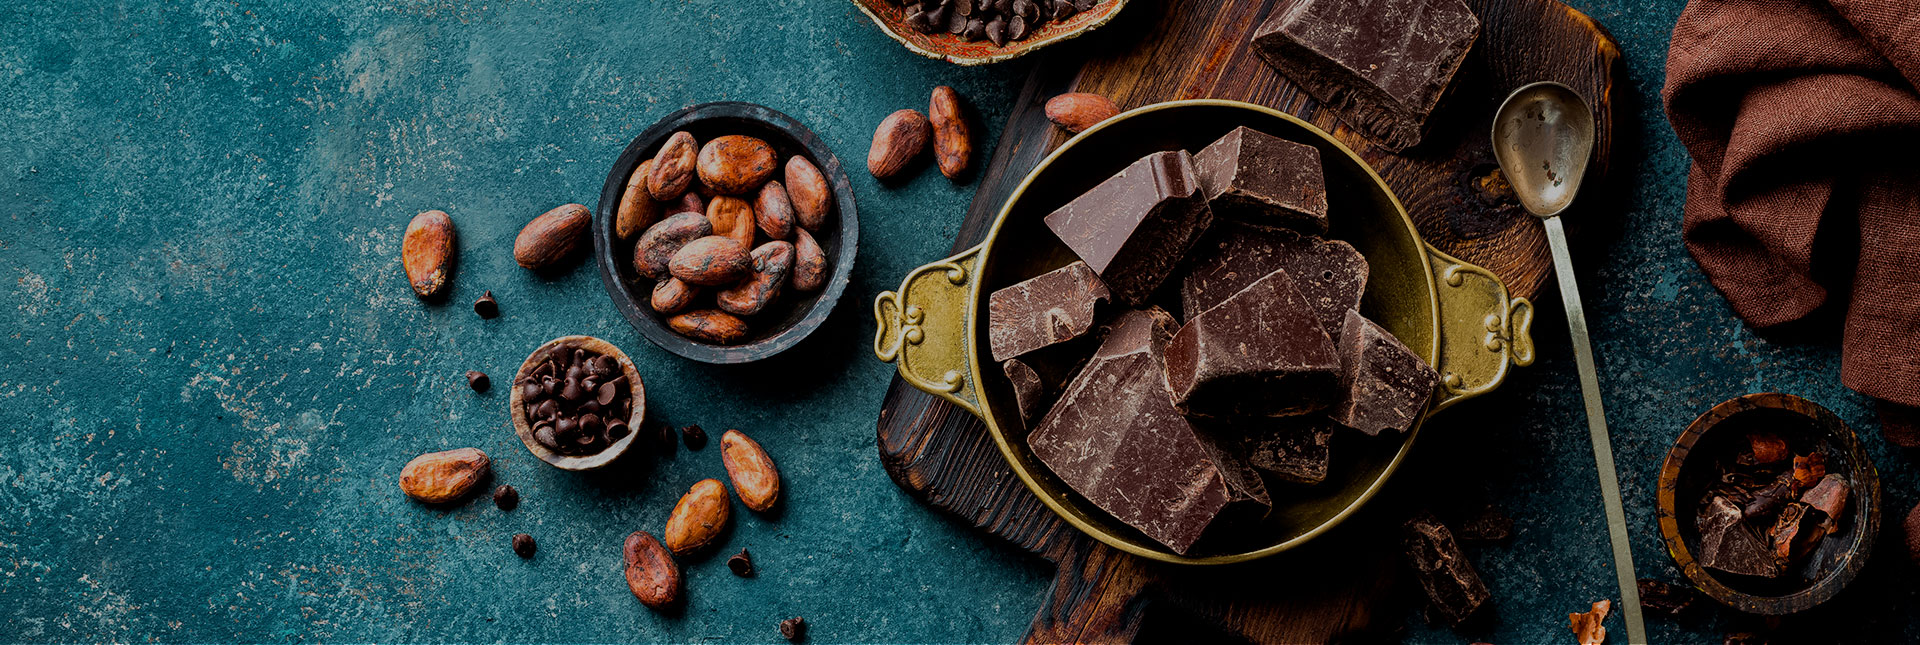 Tea & Chocolate pairings